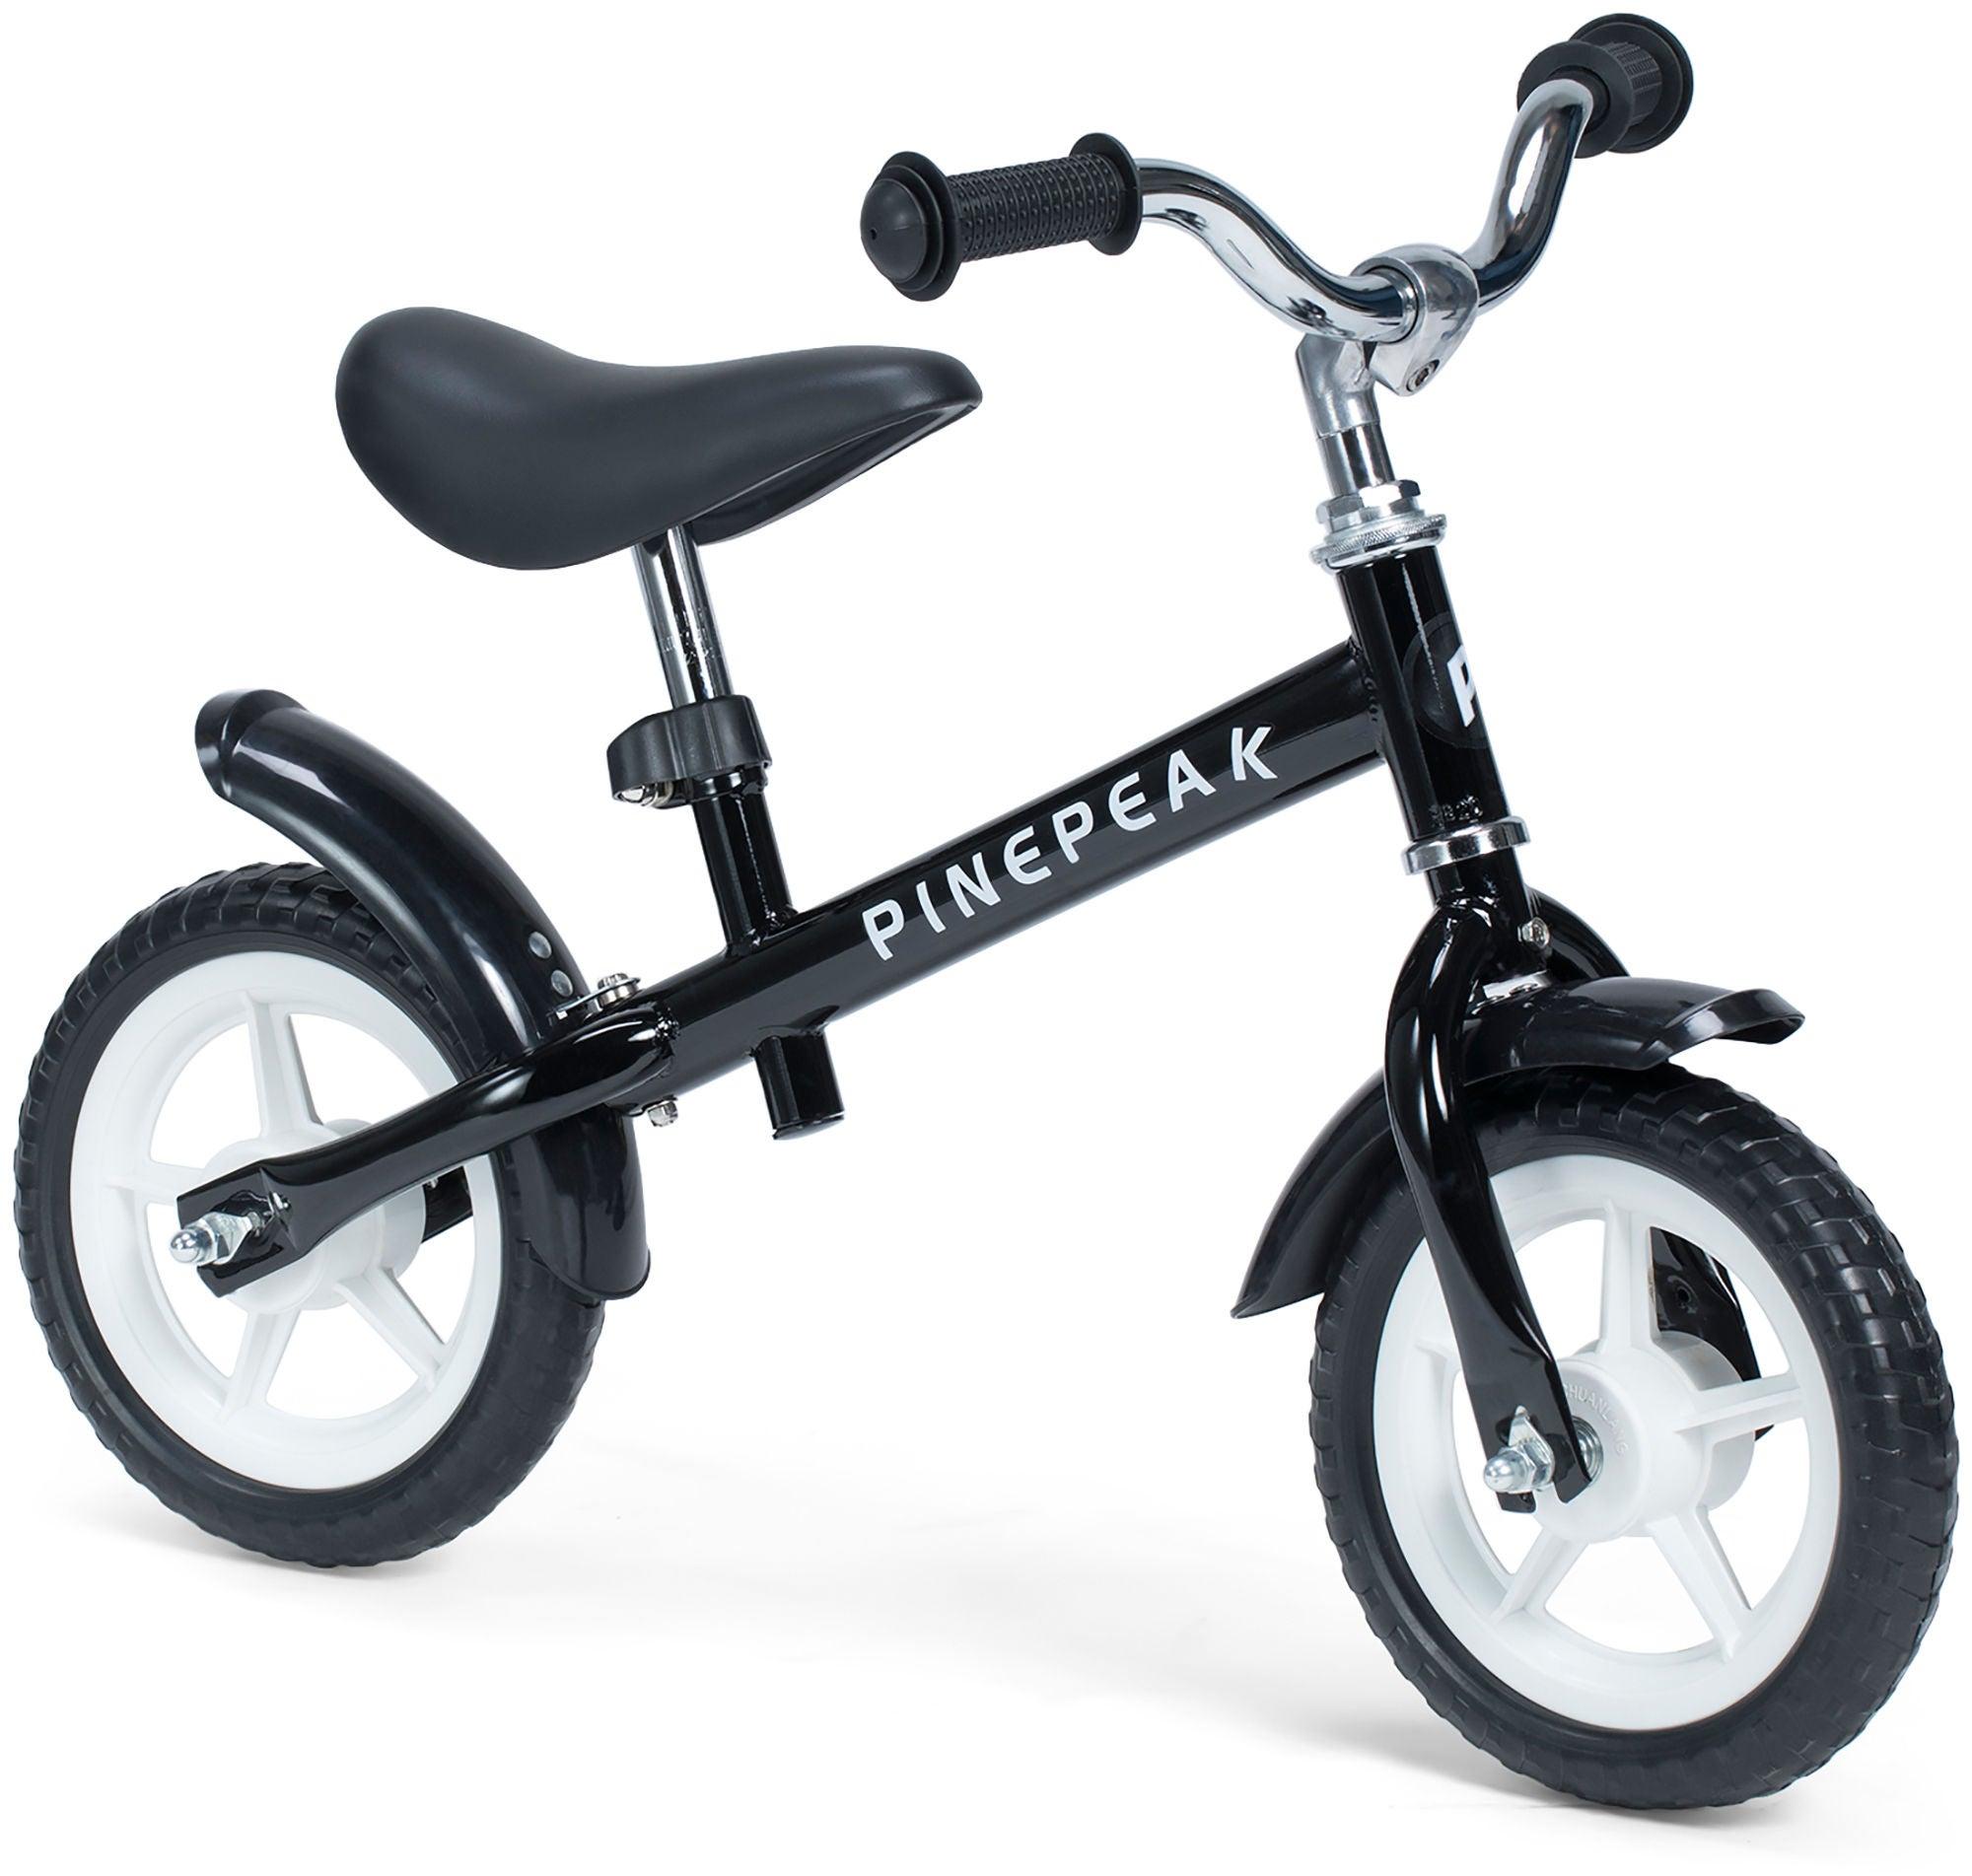 Pinepeak Komfort Springcykel 10 tum, Svart